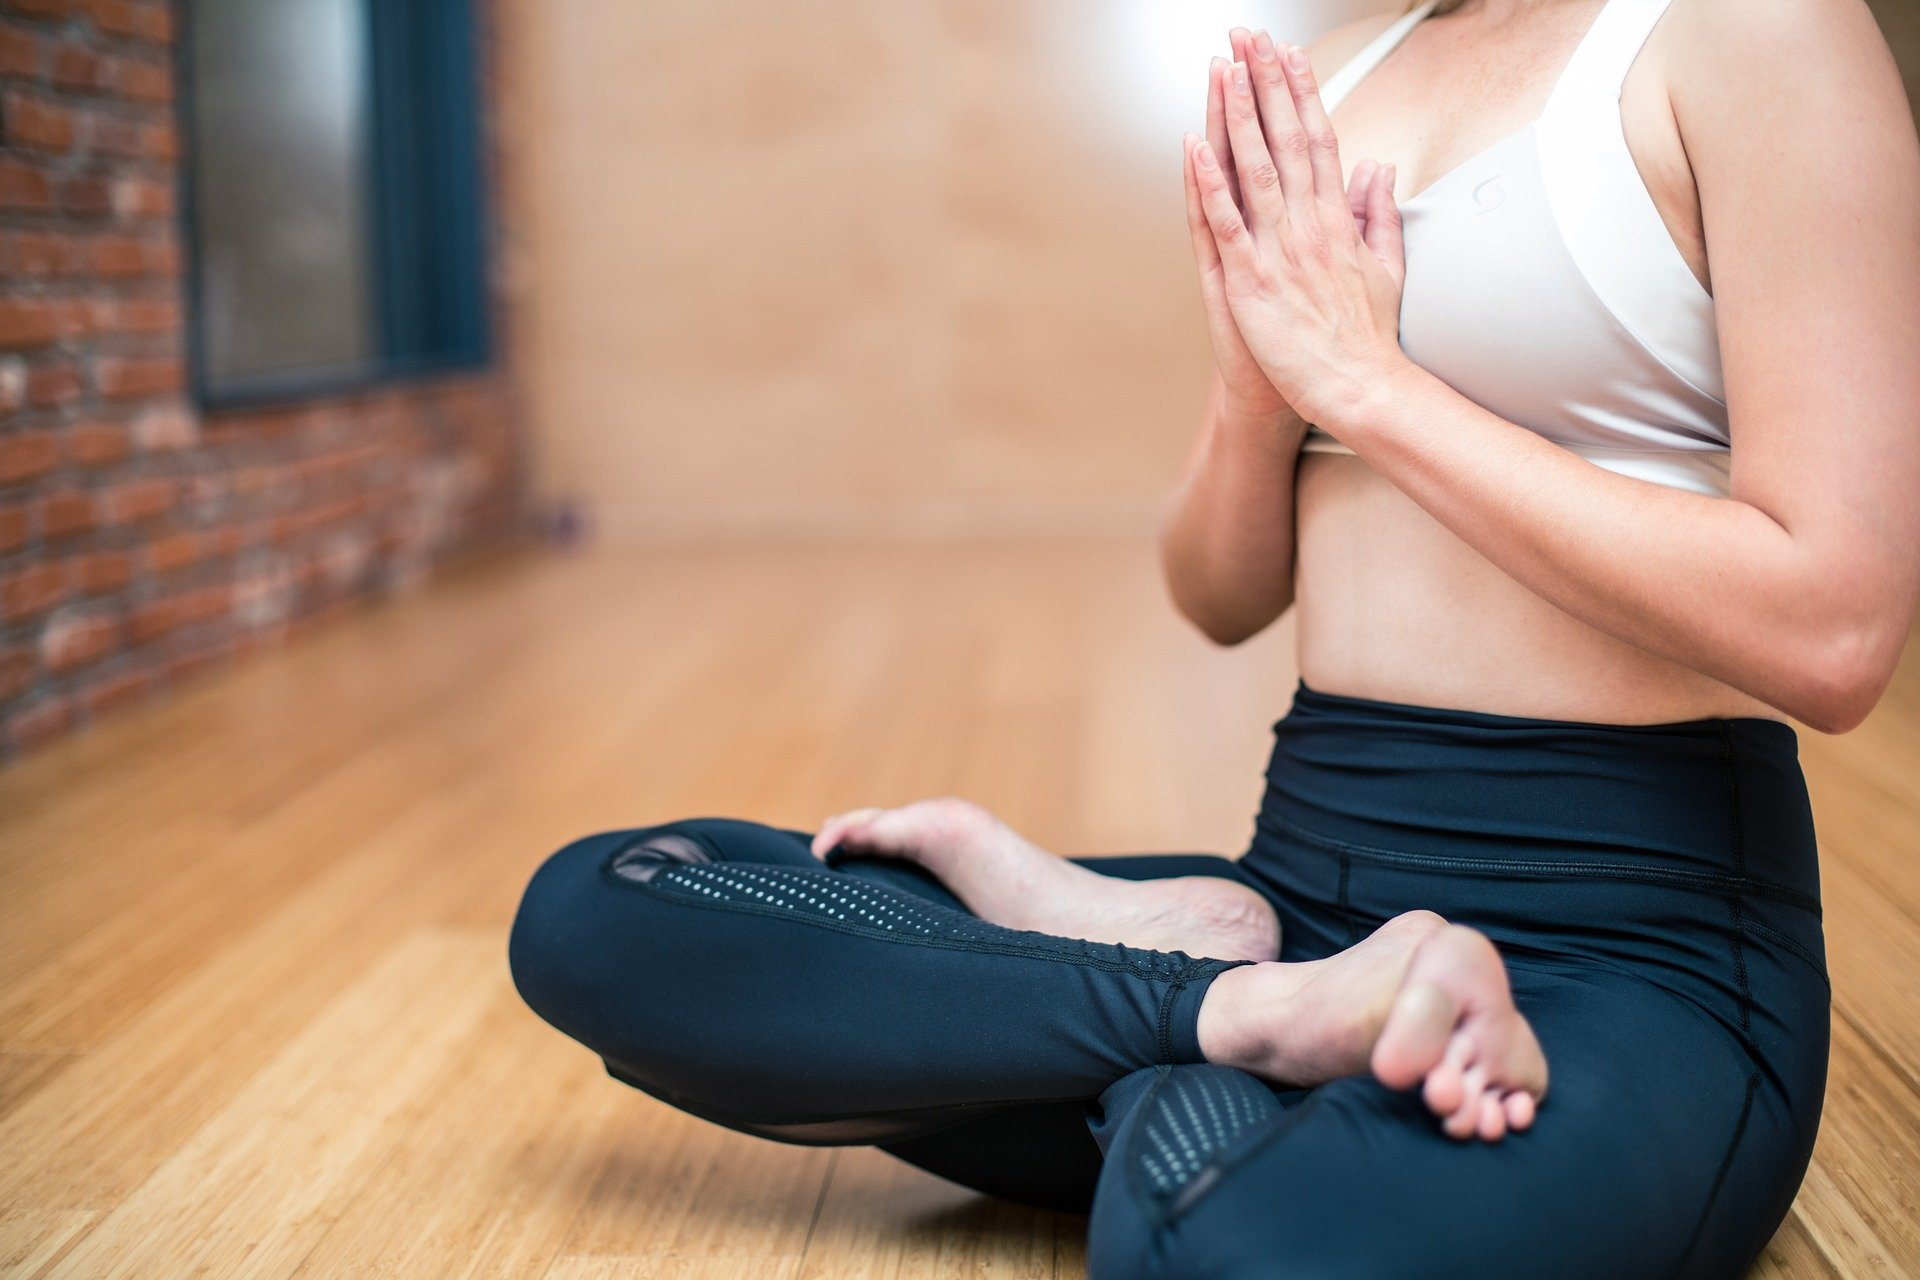 http://uf-hannover.net/wp-content/uploads/2020/05/yoga-3053488_1920.jpg